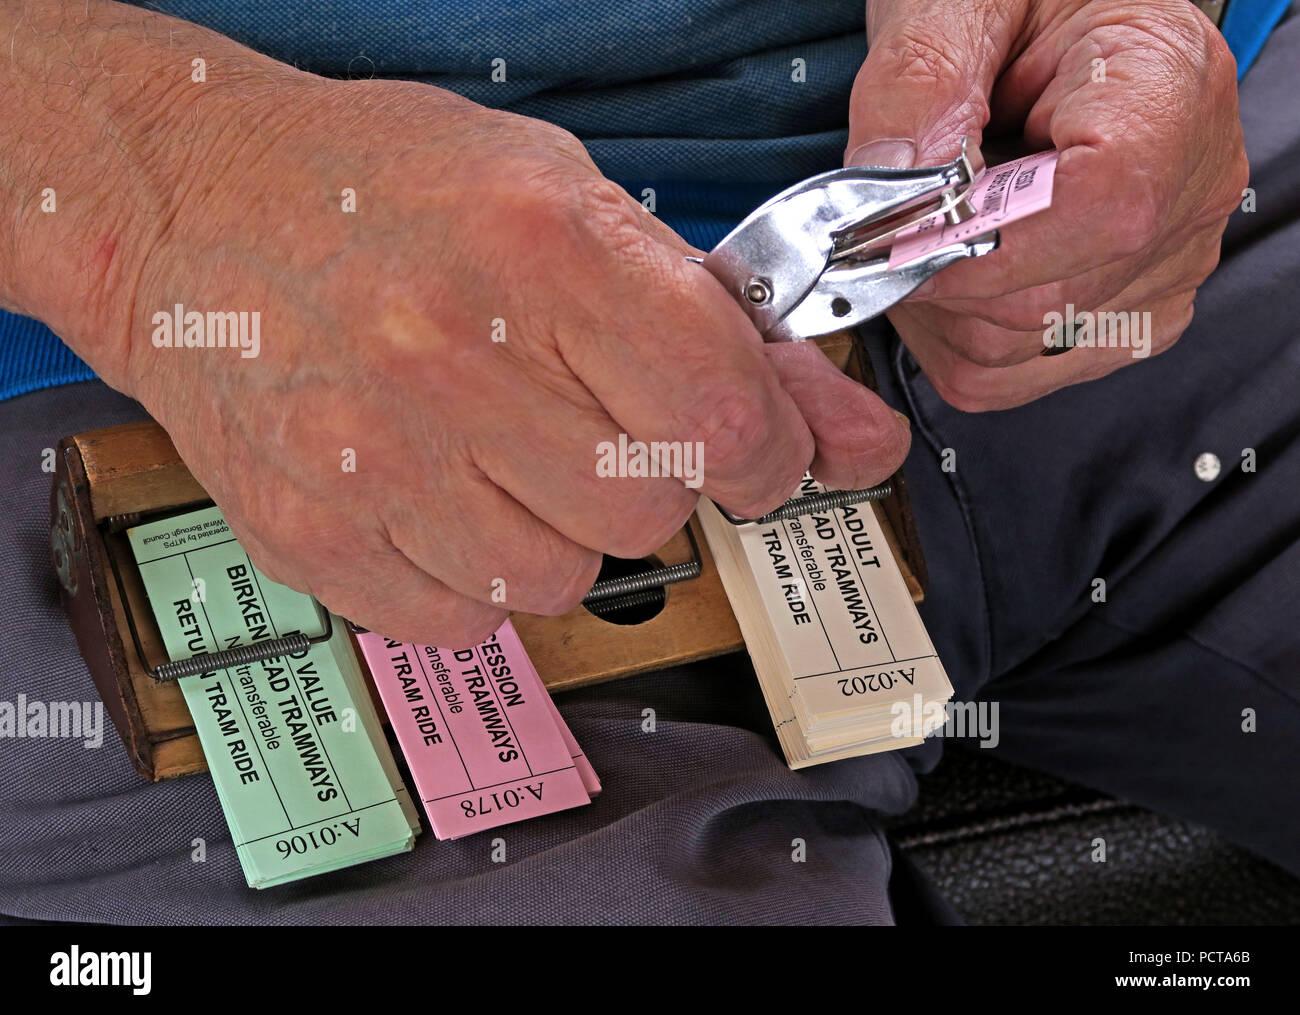 GoTonySmith,@HotpixUK,Tram,ticket,ticketsTram